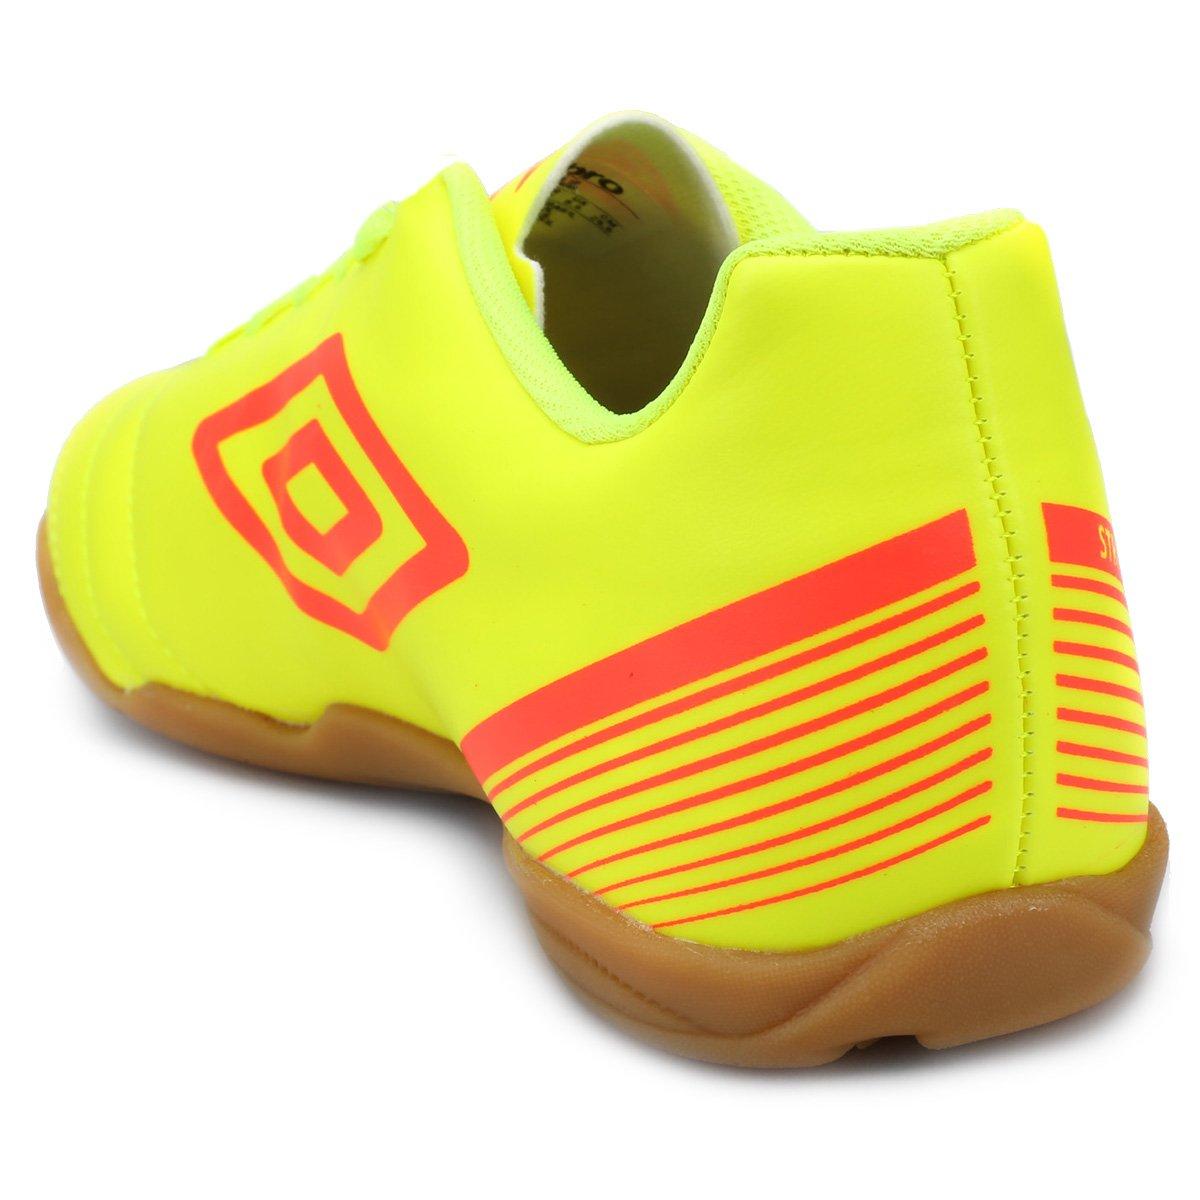 Vermelho Amarelo 3 Masculina e Chuteira Fluorescente Futsal Umbro Striker Owq8x7T8